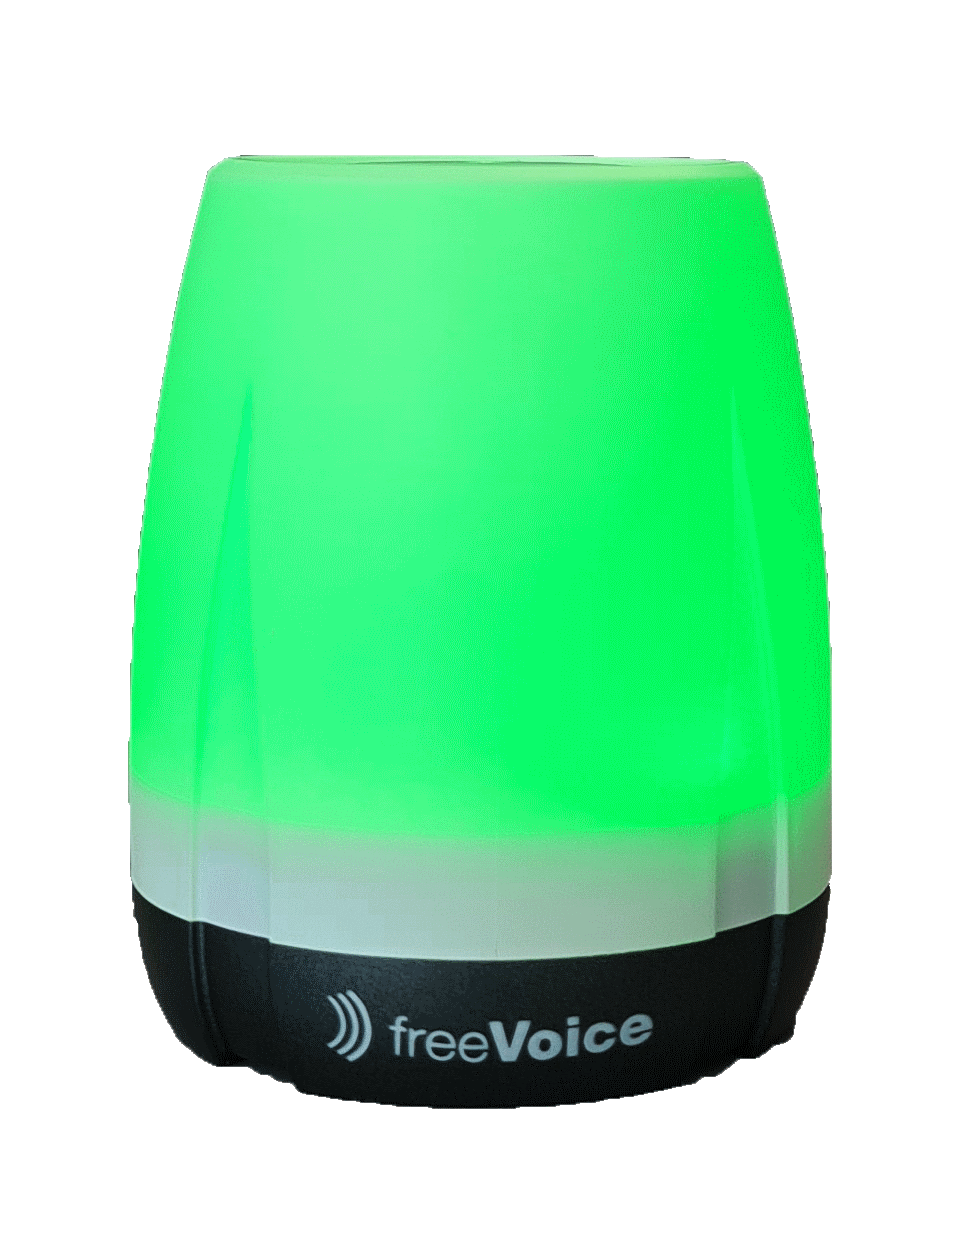 freeVoice Busylight UC 100 (USB)